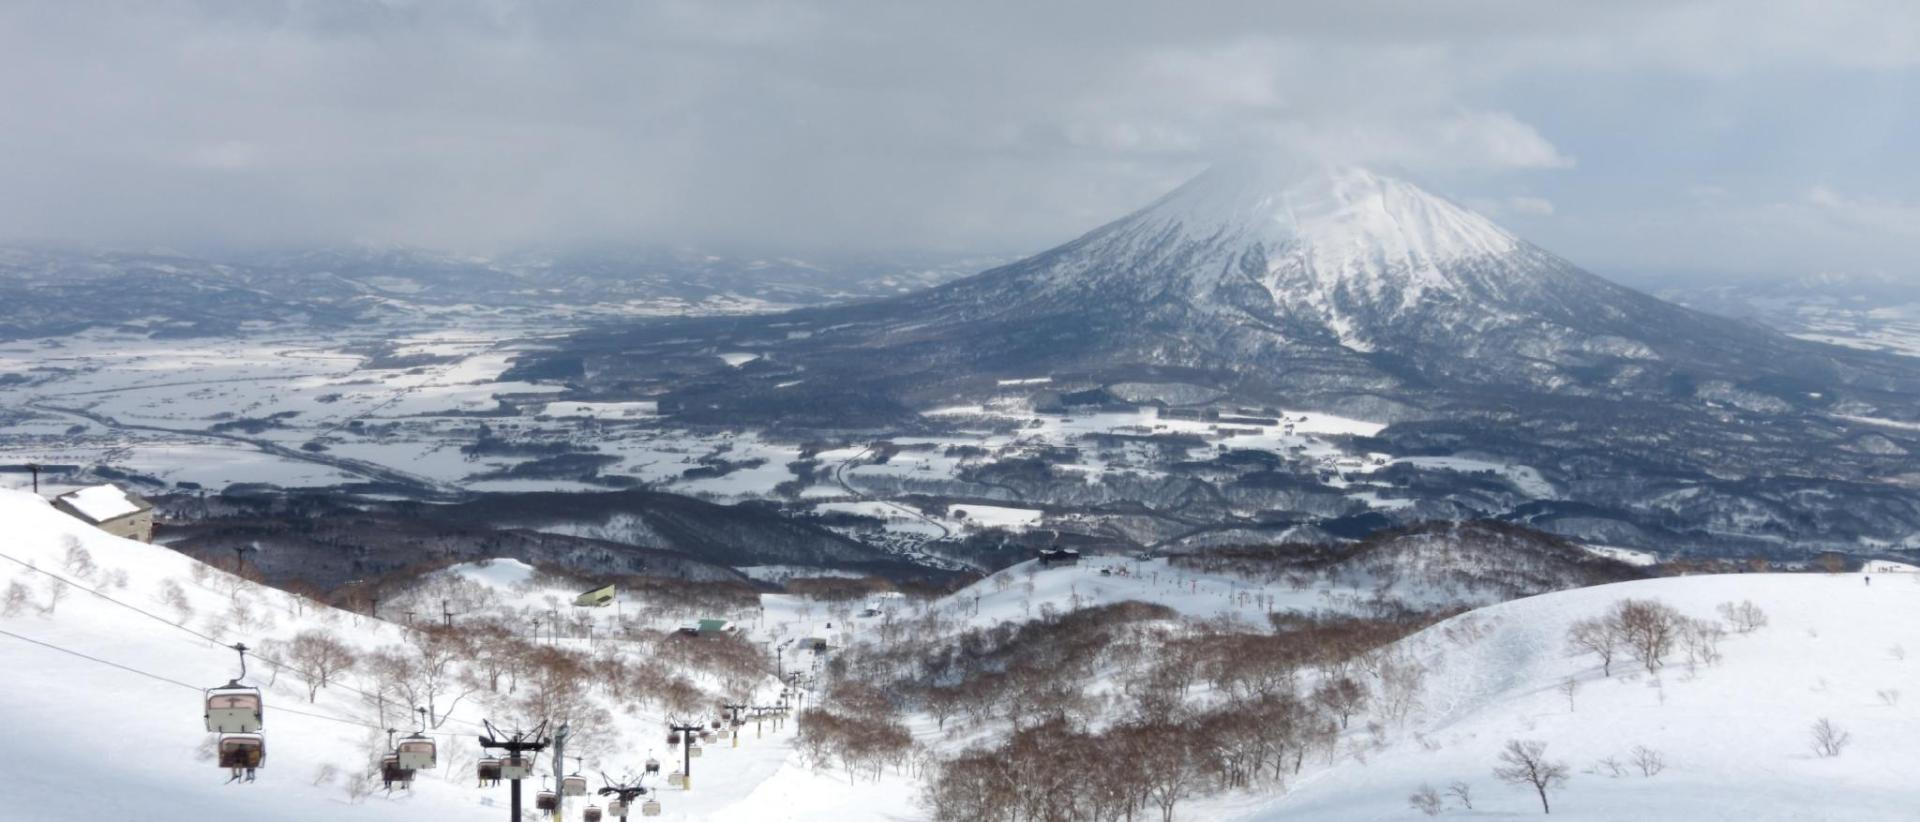 Hotels Near Niseko Village Ski Resort Niseko Best Hotel Rates Near Ski Area Niseko Japan